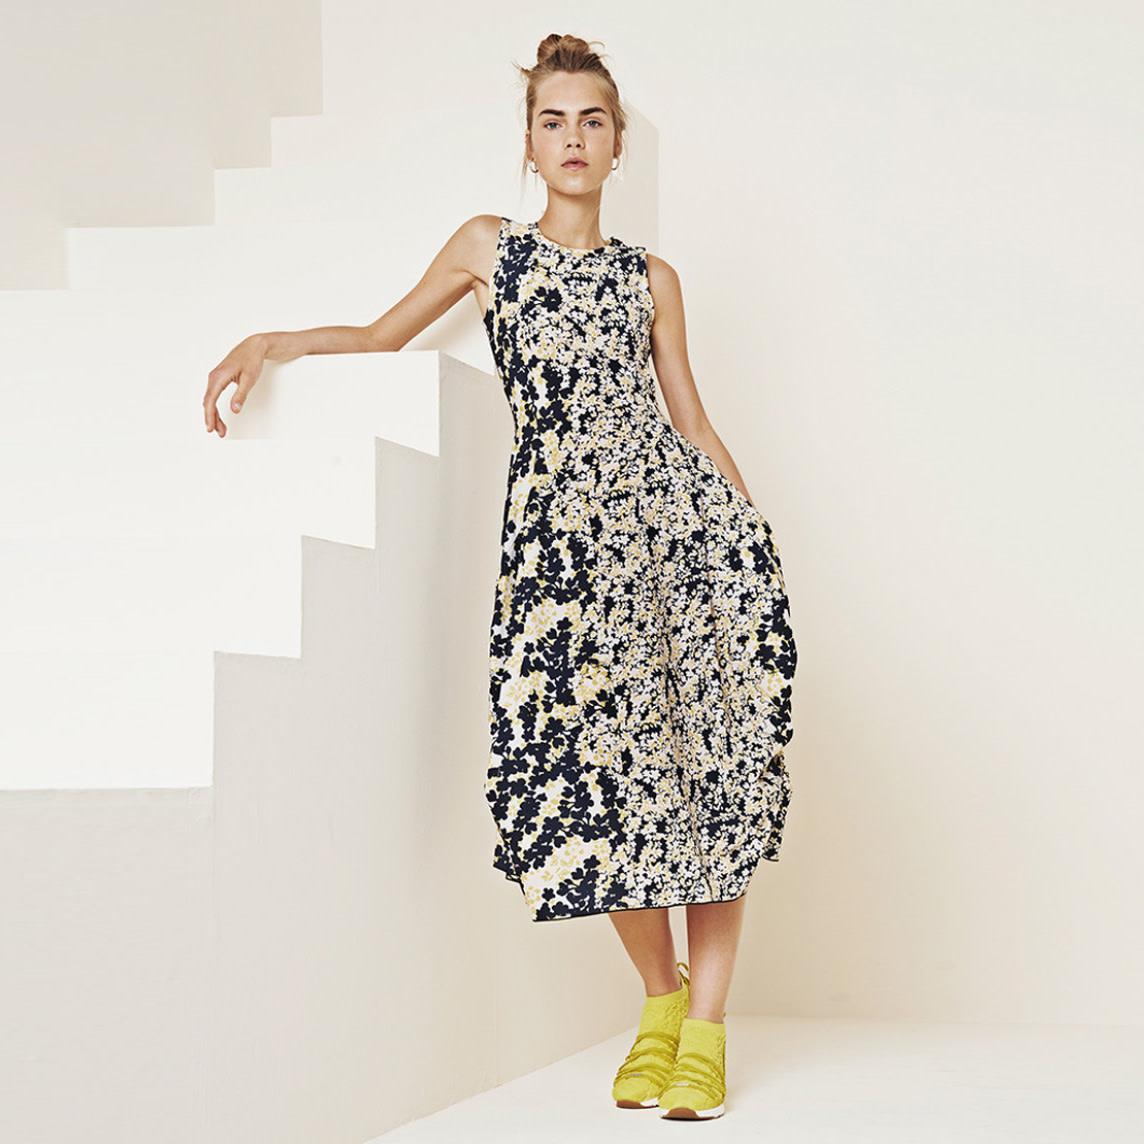 HIGH HIGH At-Length Dress - Navy/Yellow